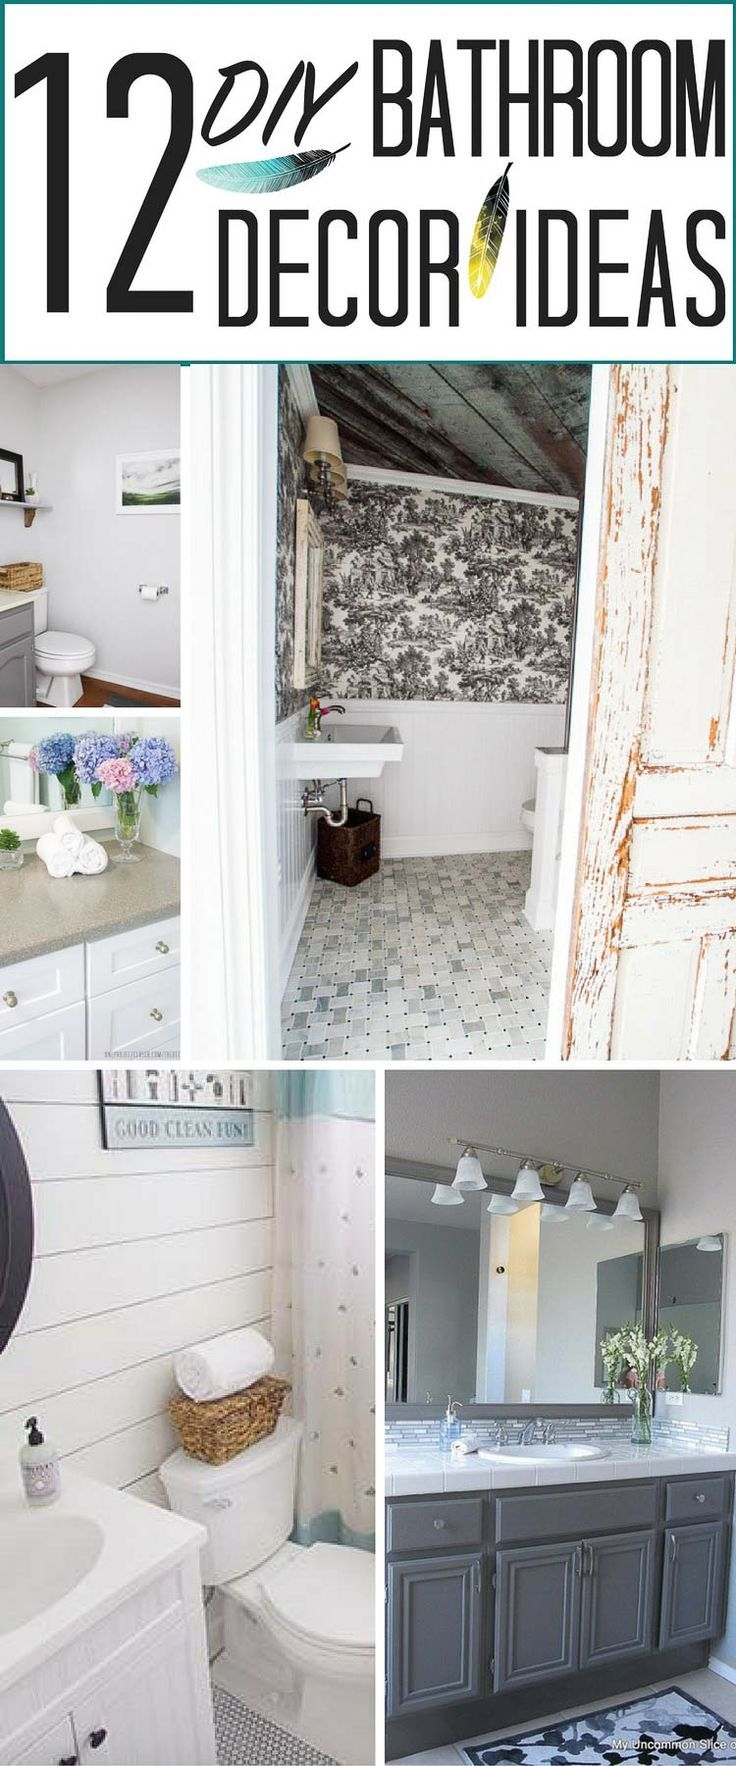 12 DIY Bathroom Decor Ideas (& a crapload of nasty toilet and barf ...